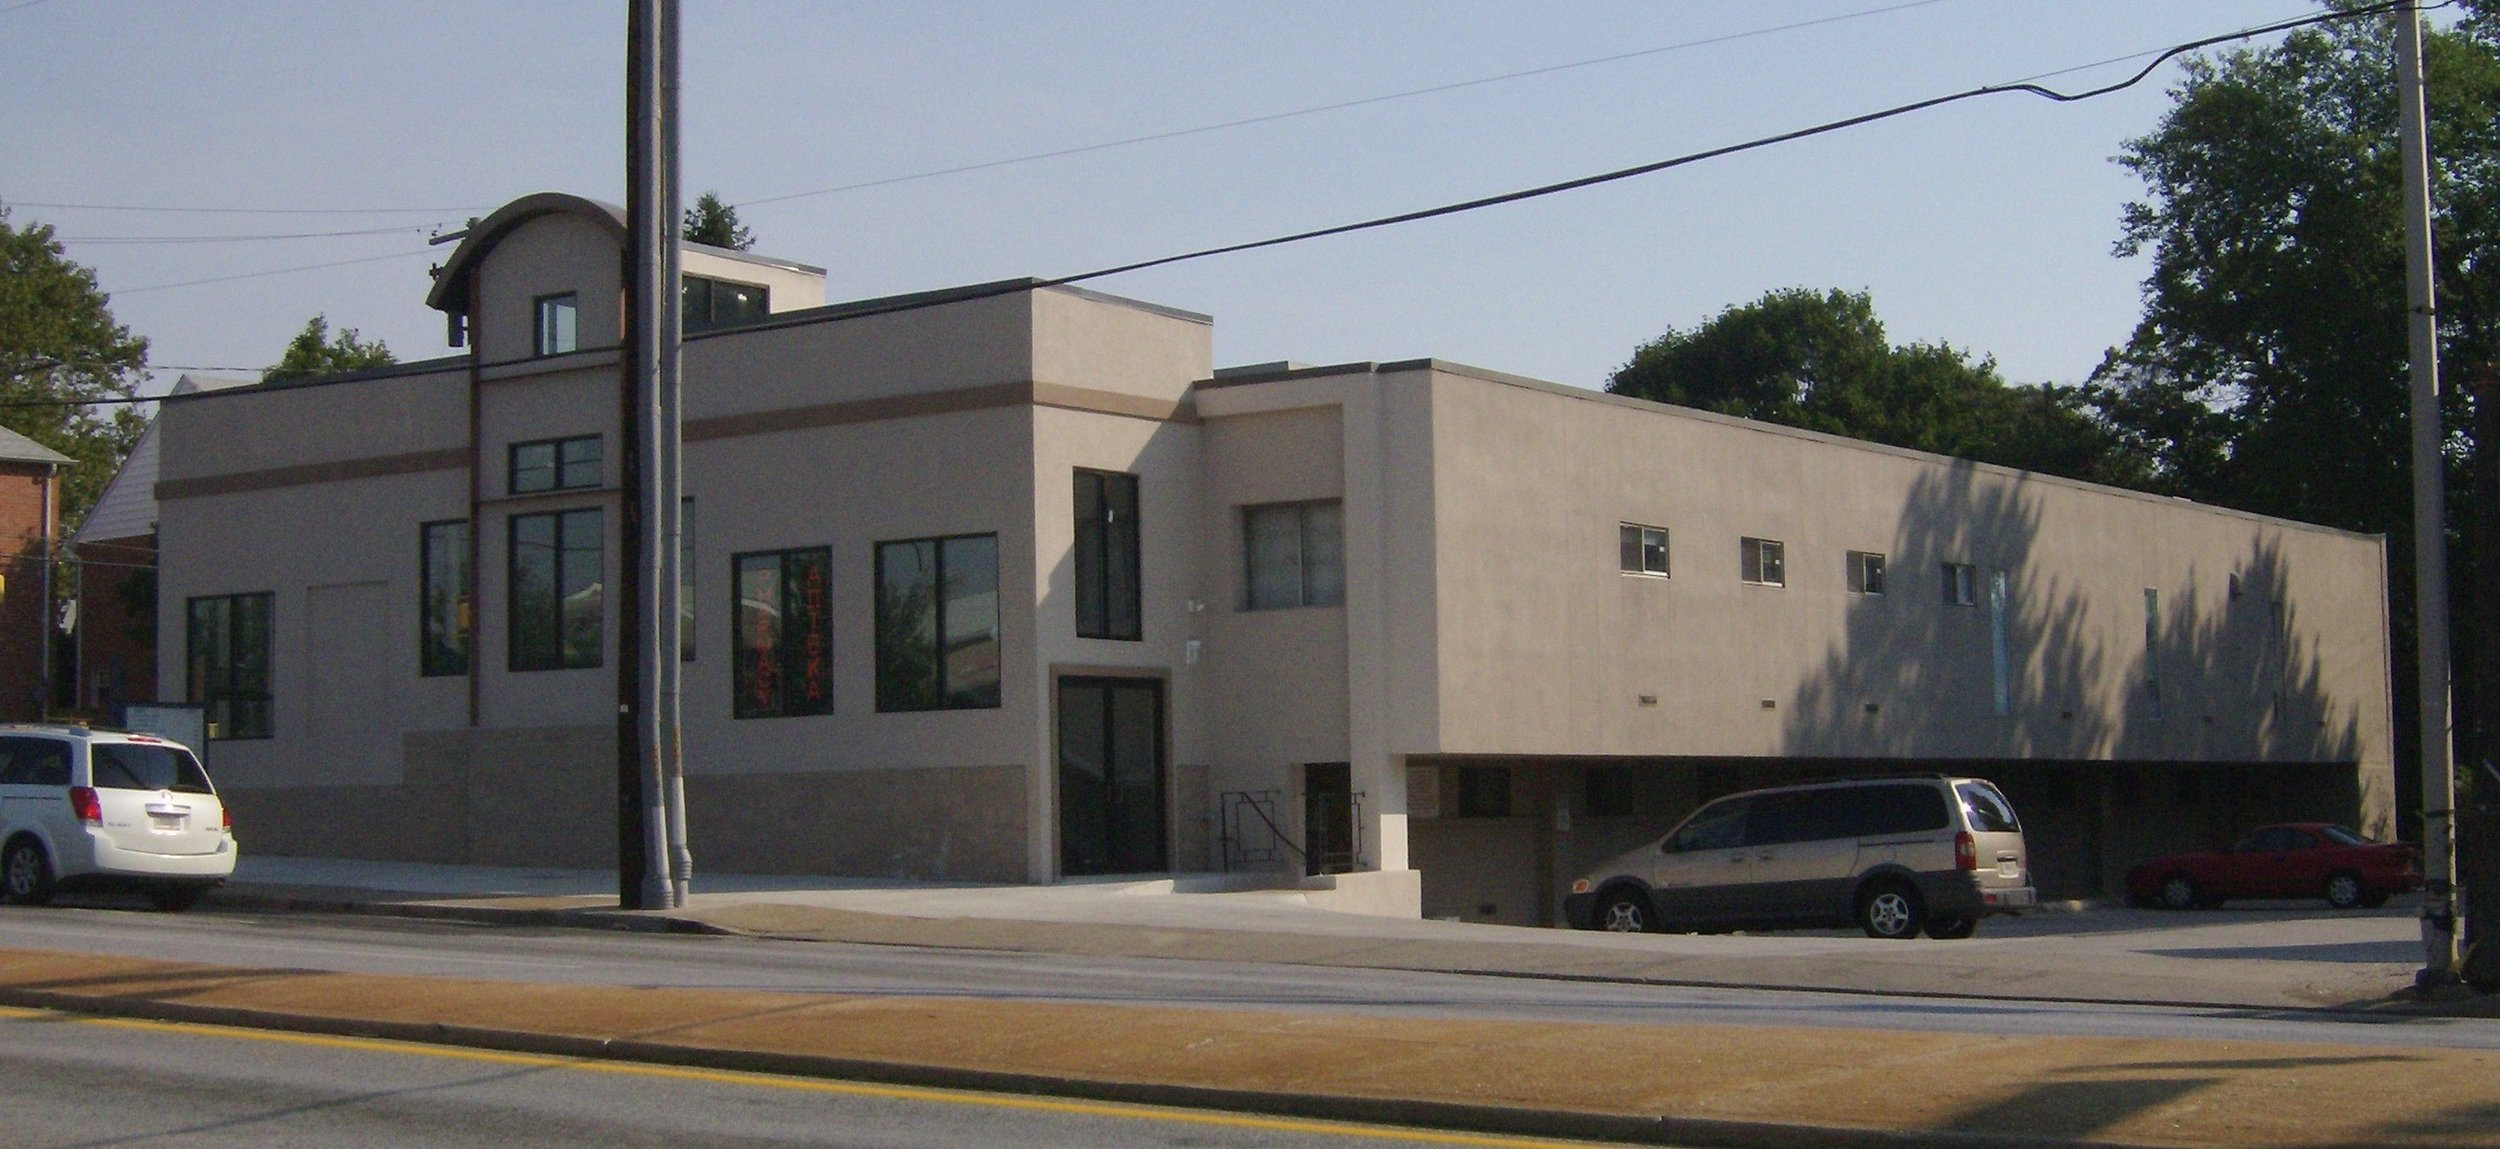 Fallstaff Medical Office Renovation and Addition